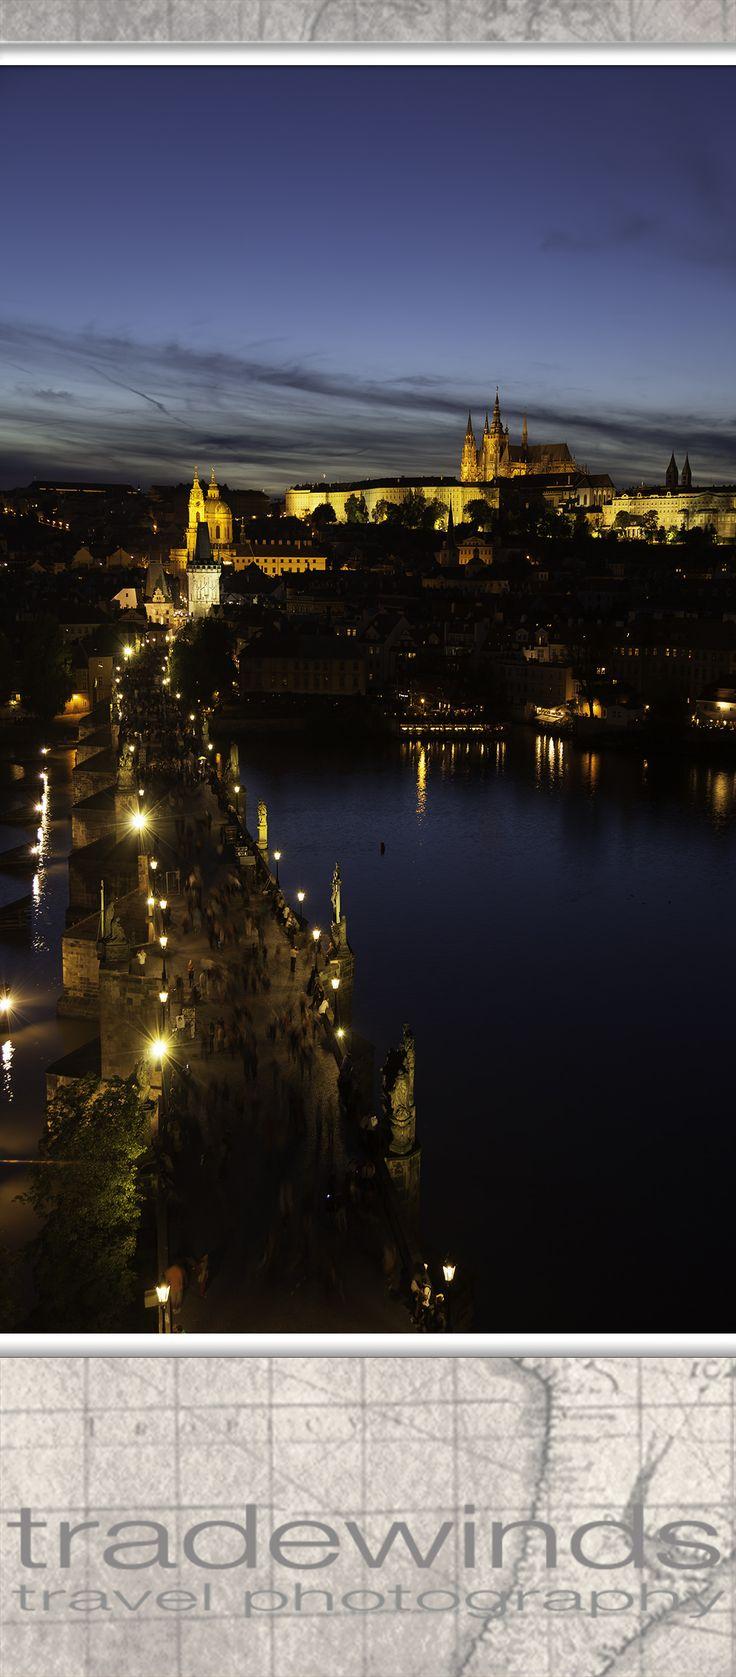 Charles bridge at night, old town Prague, Czech Republic.